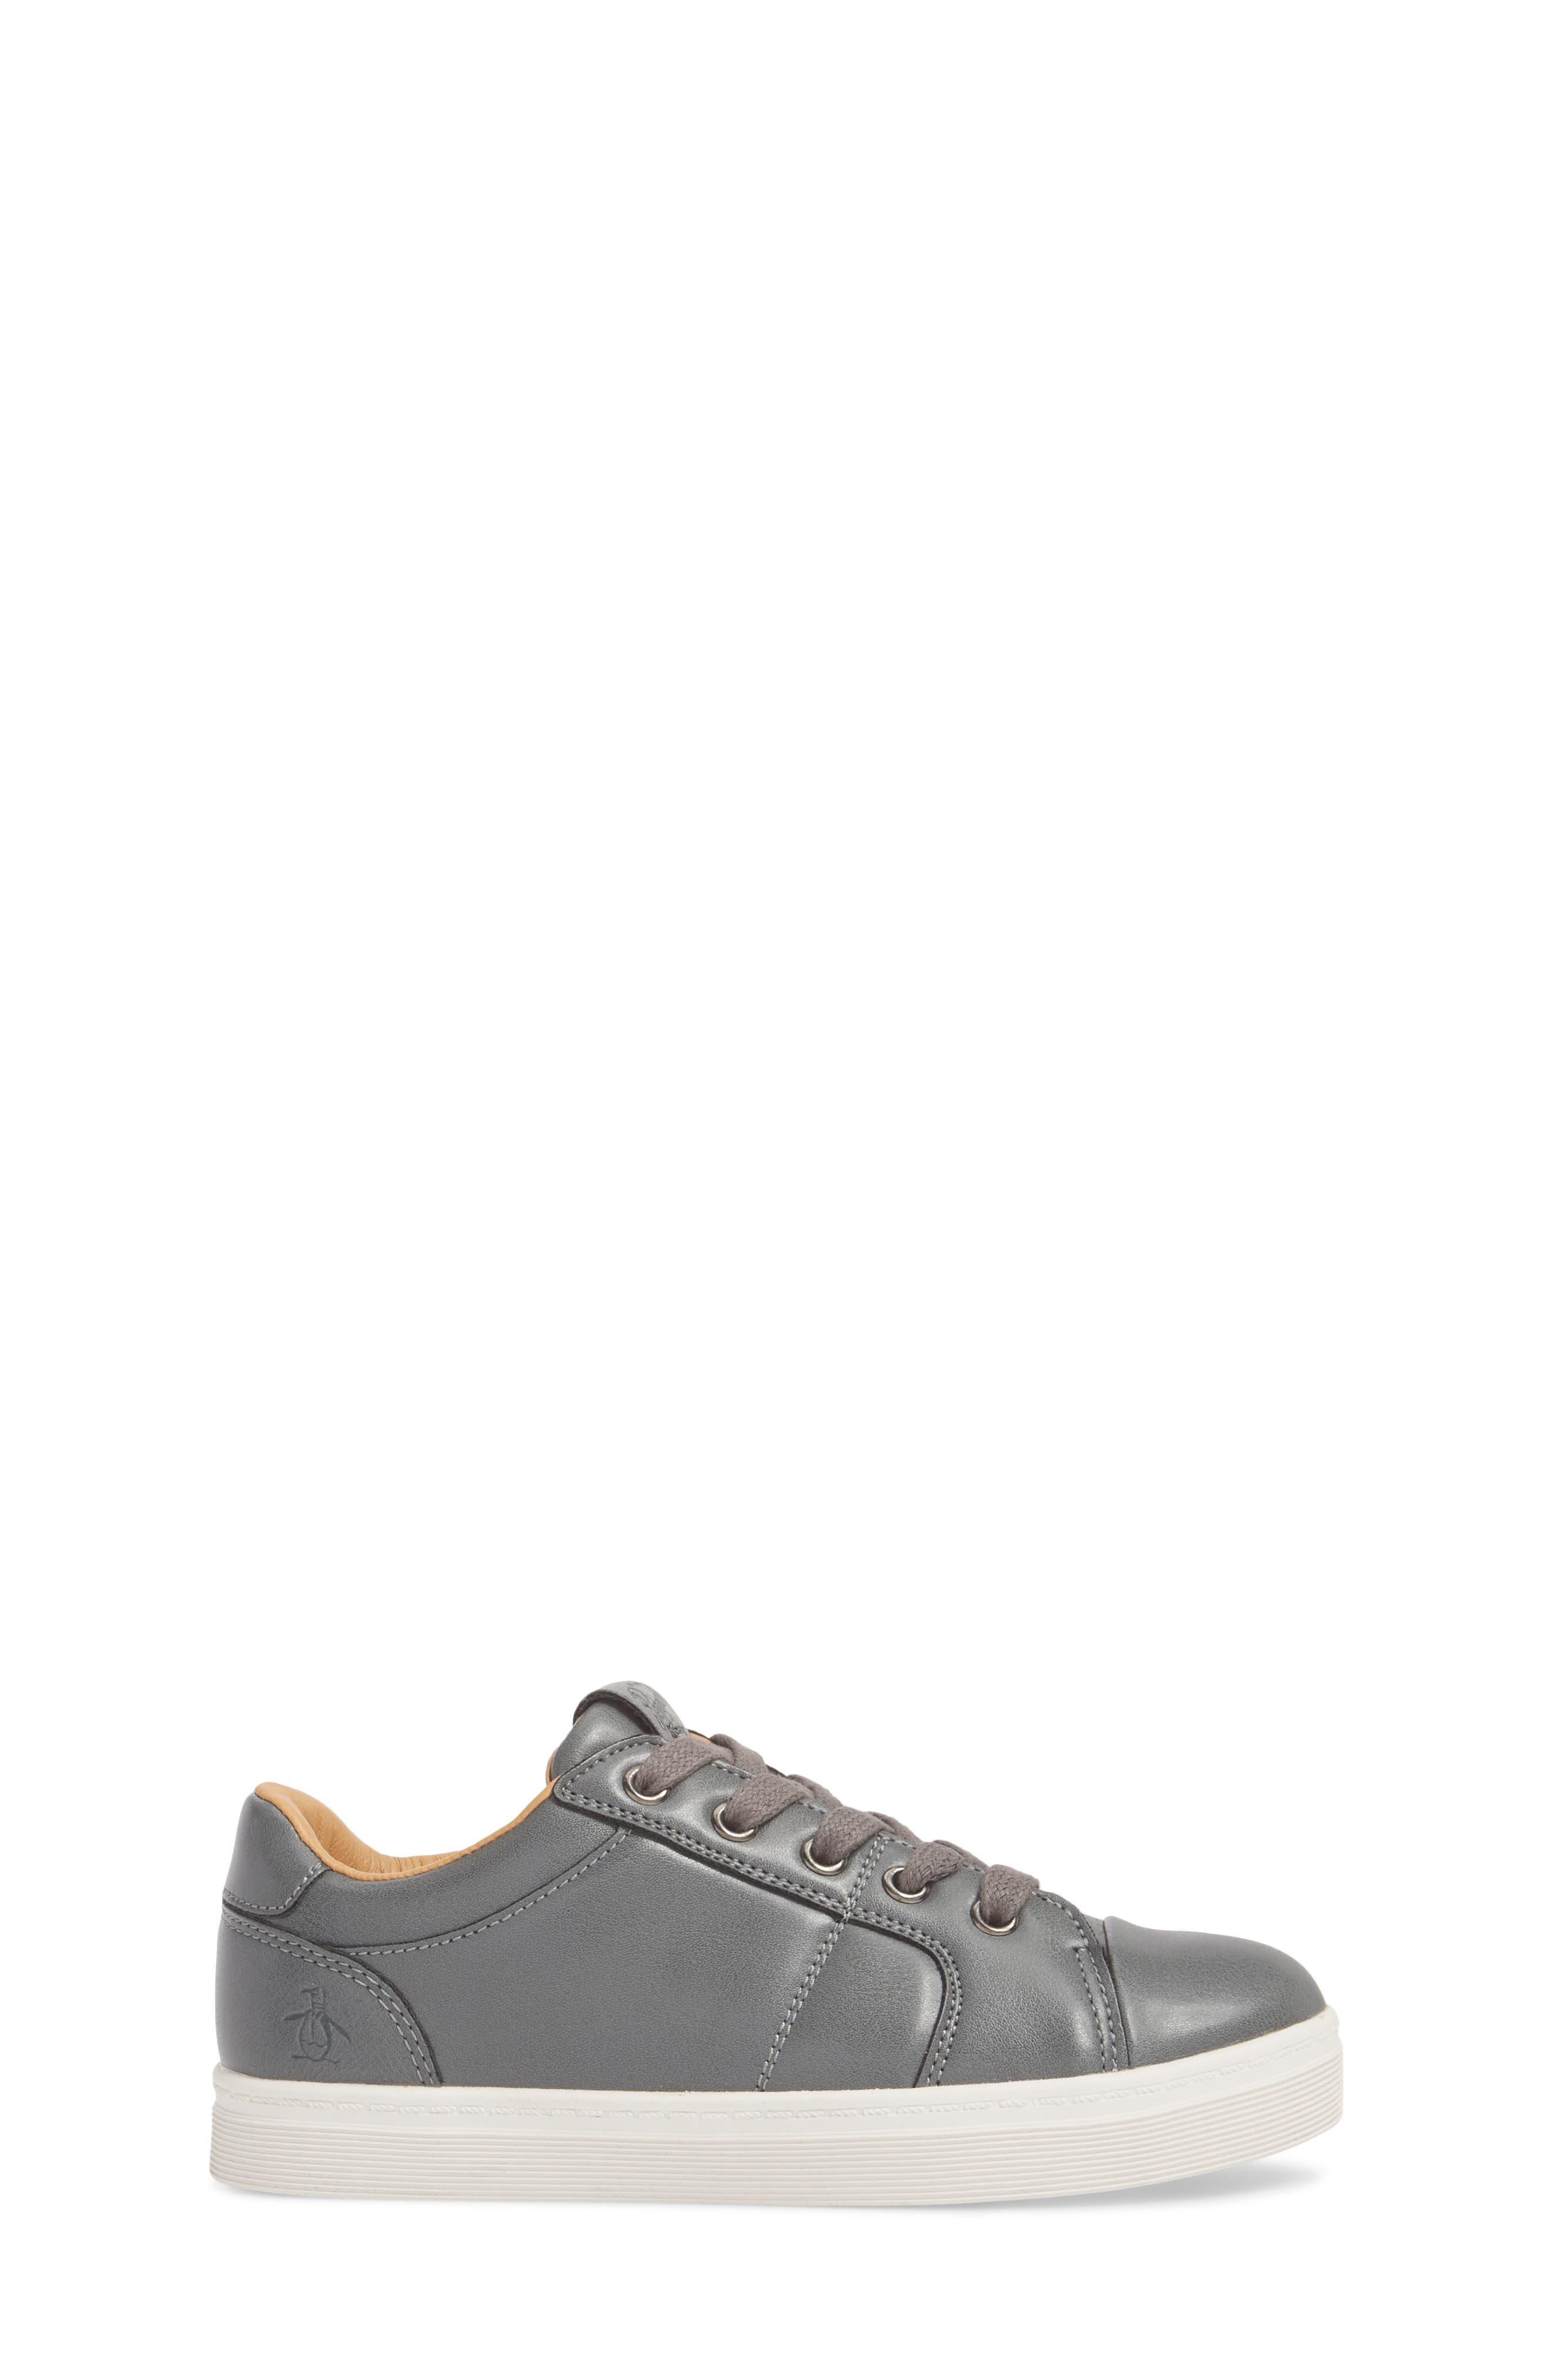 Cobin Sneaker,                             Alternate thumbnail 3, color,                             020